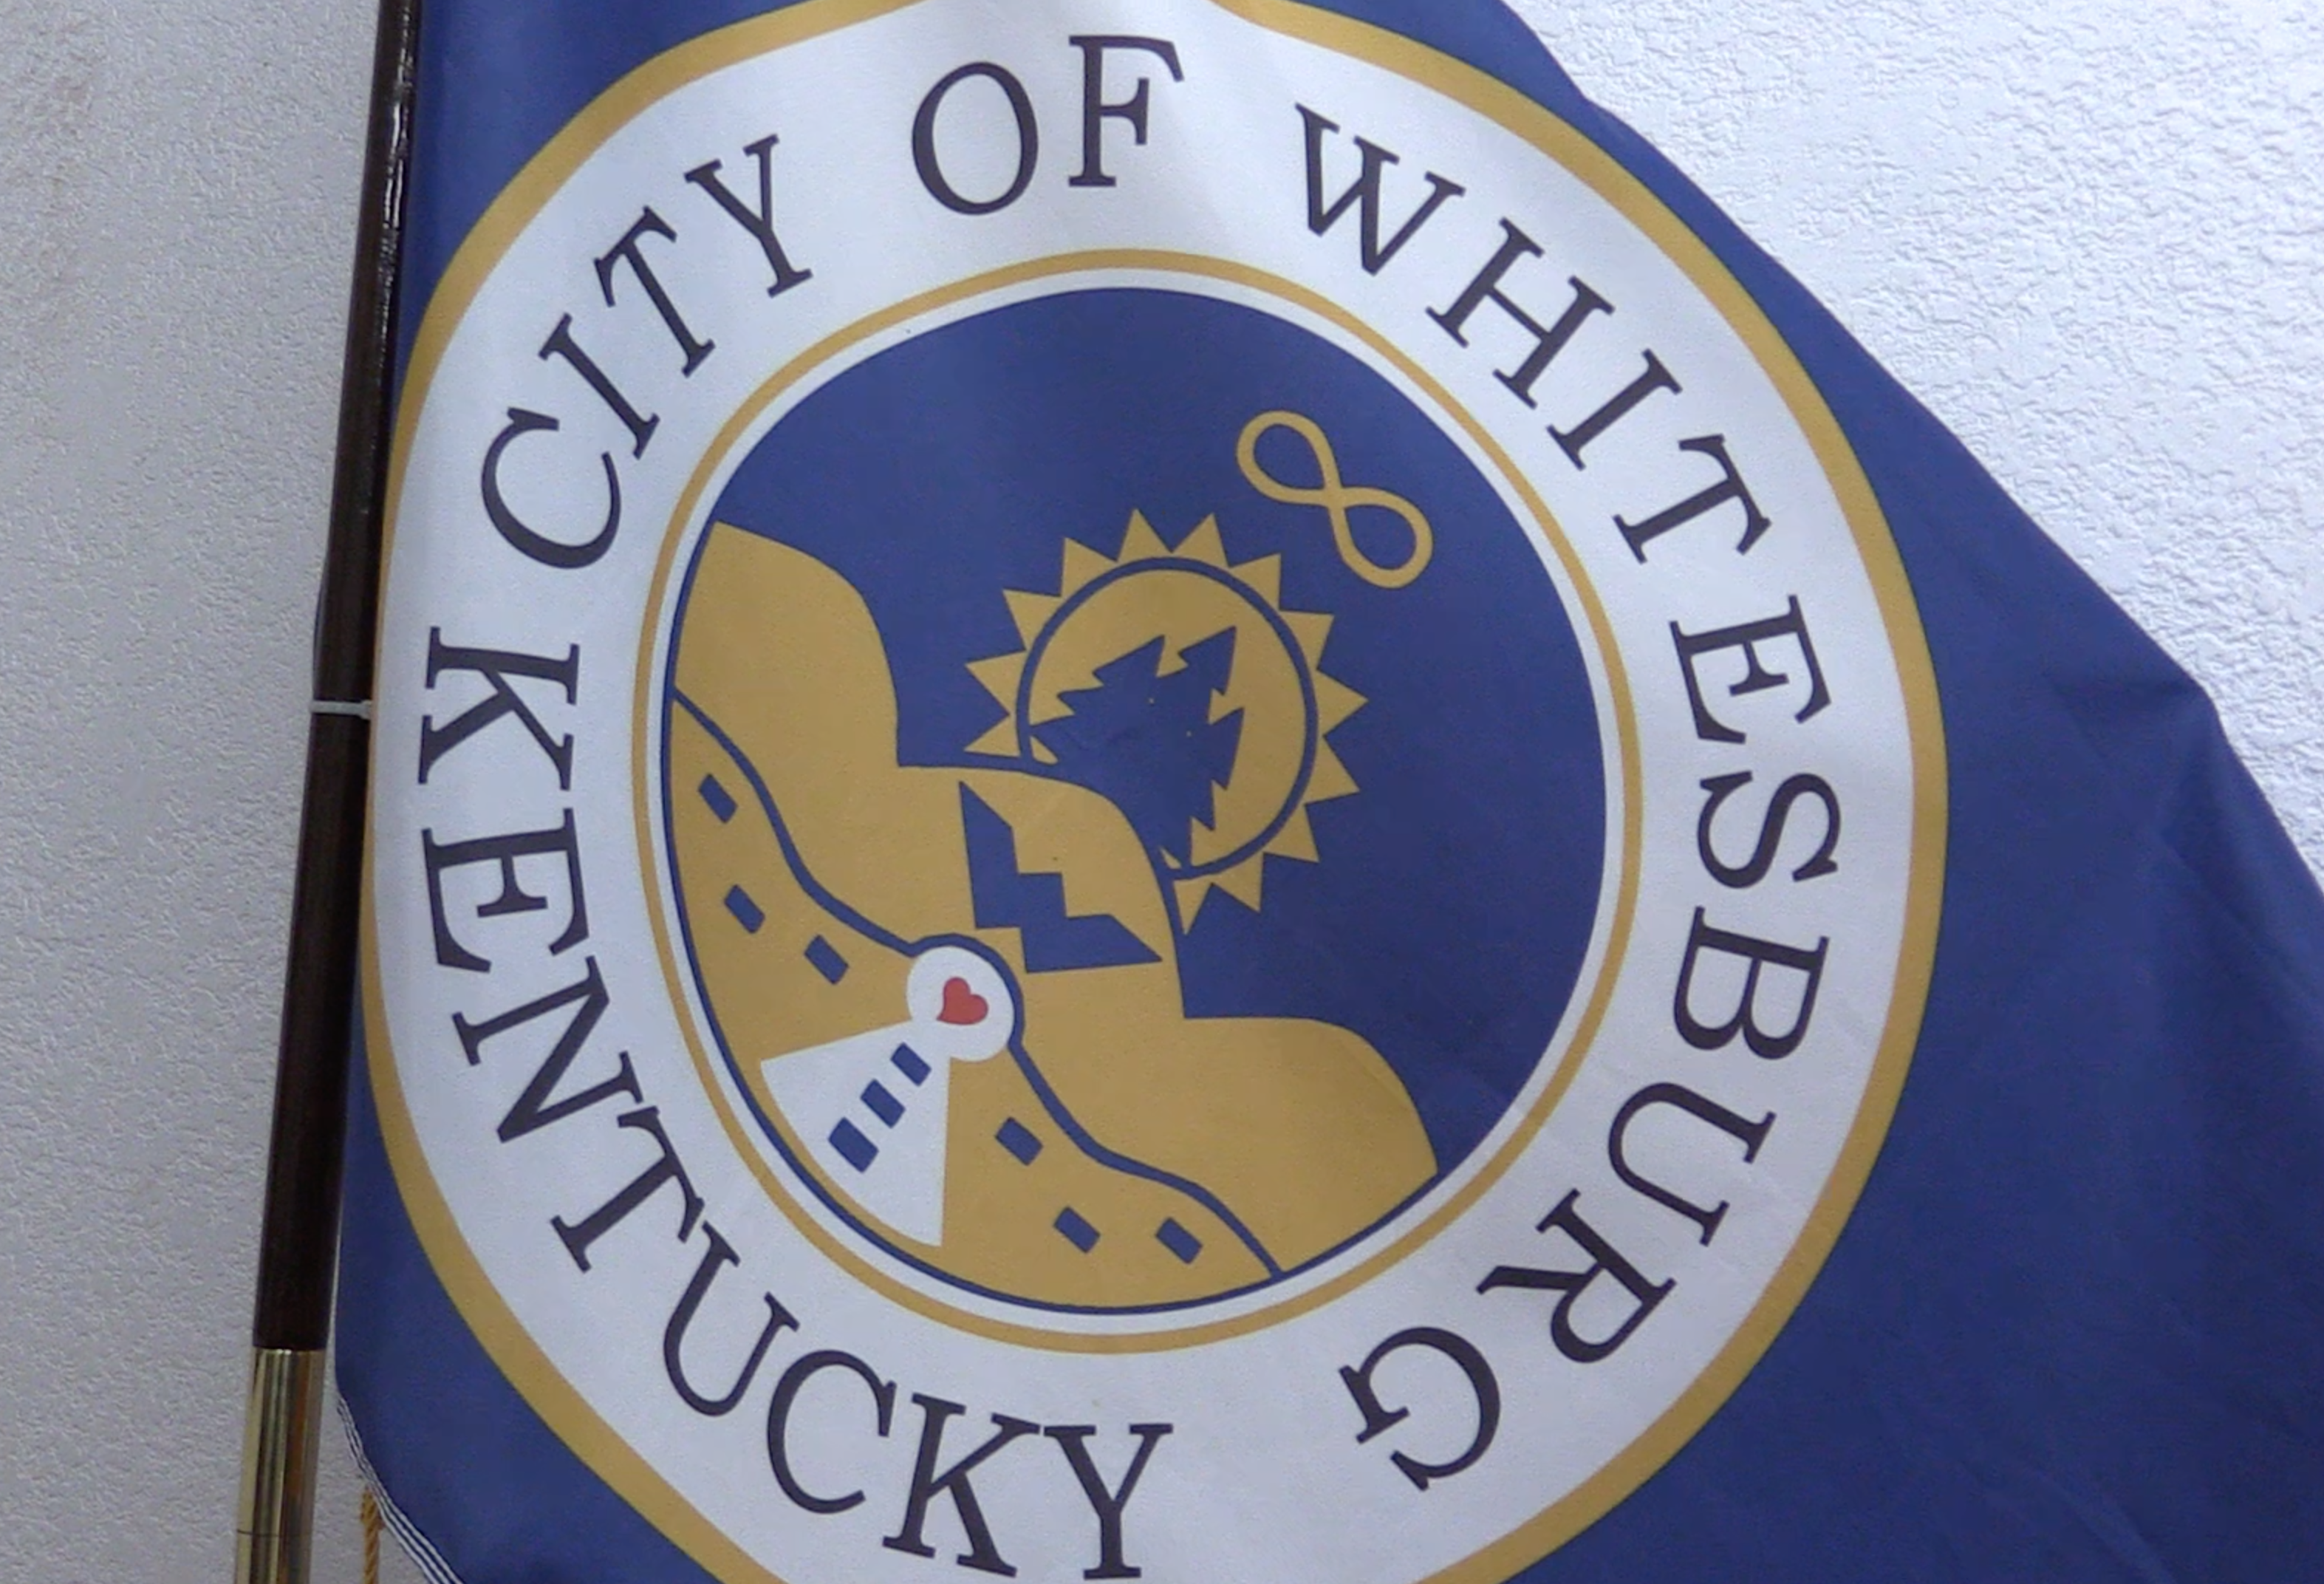 Whitesburg approved for million-dollar loan for water tanks